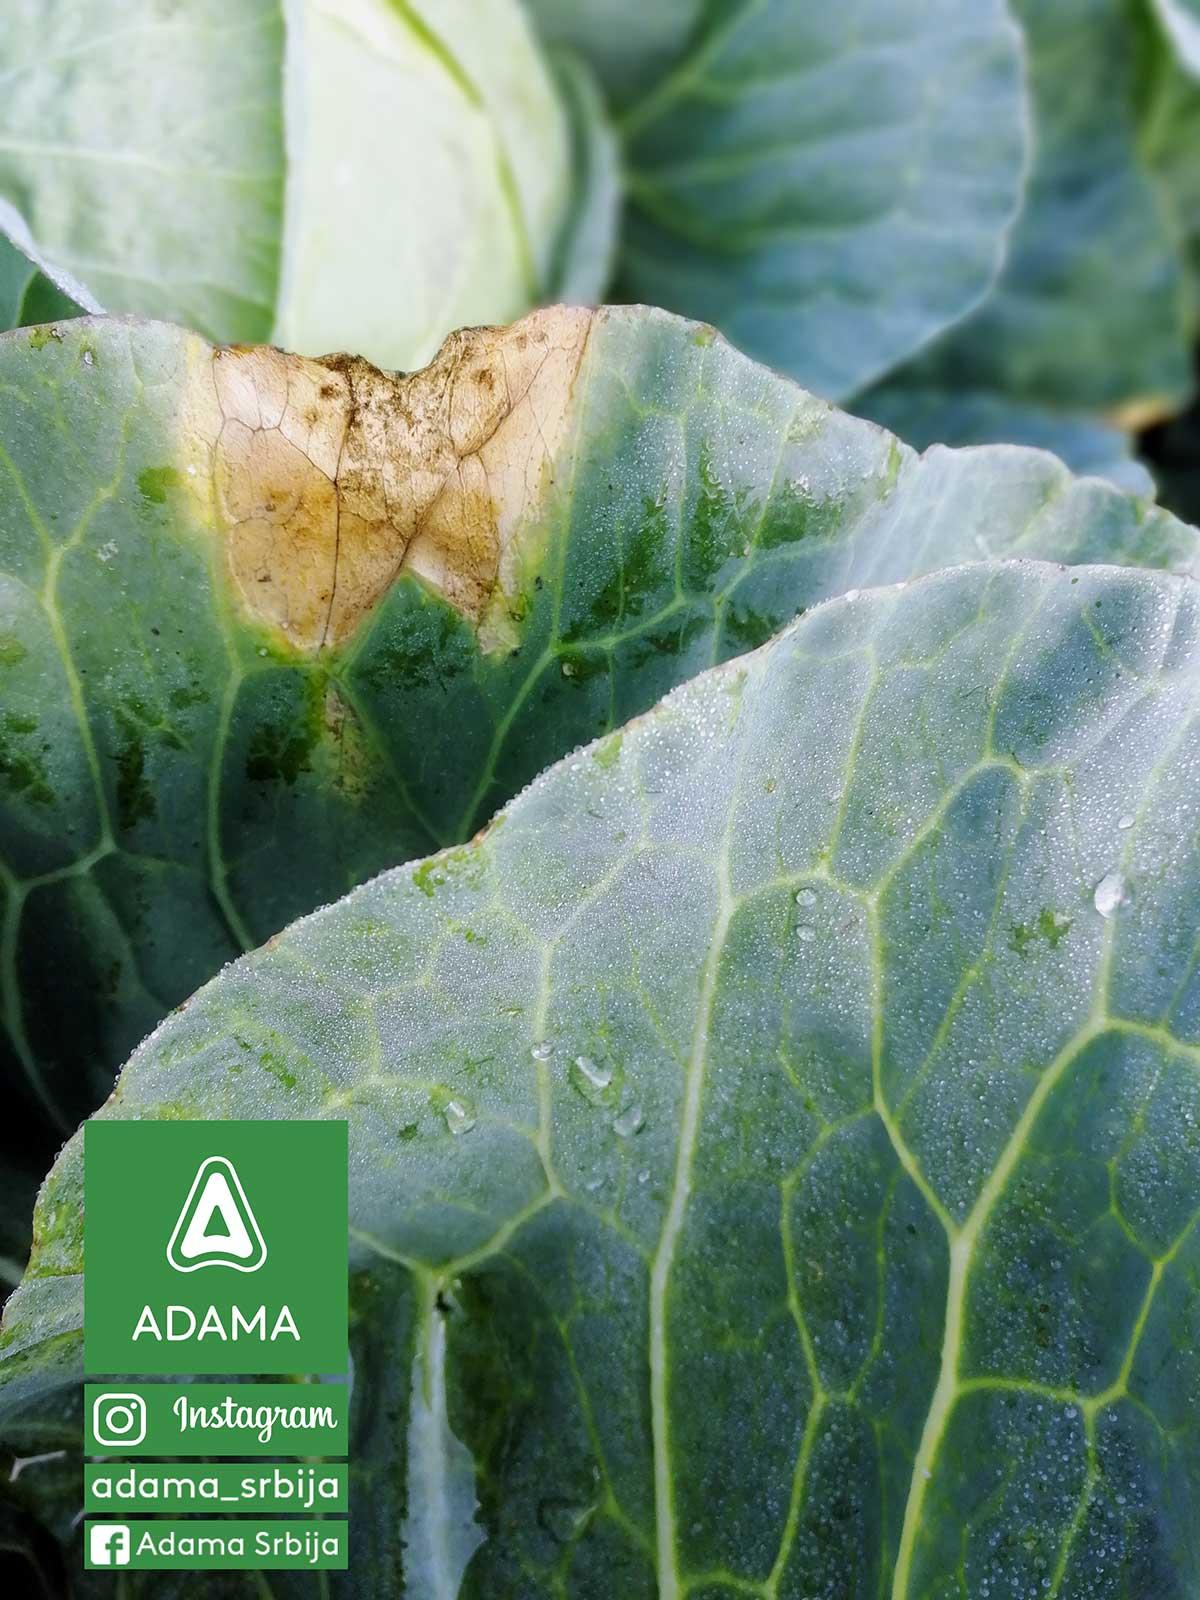 Agrosaveti---Adama---Povce---Kupus---Kupusnjace---Crna-trulez